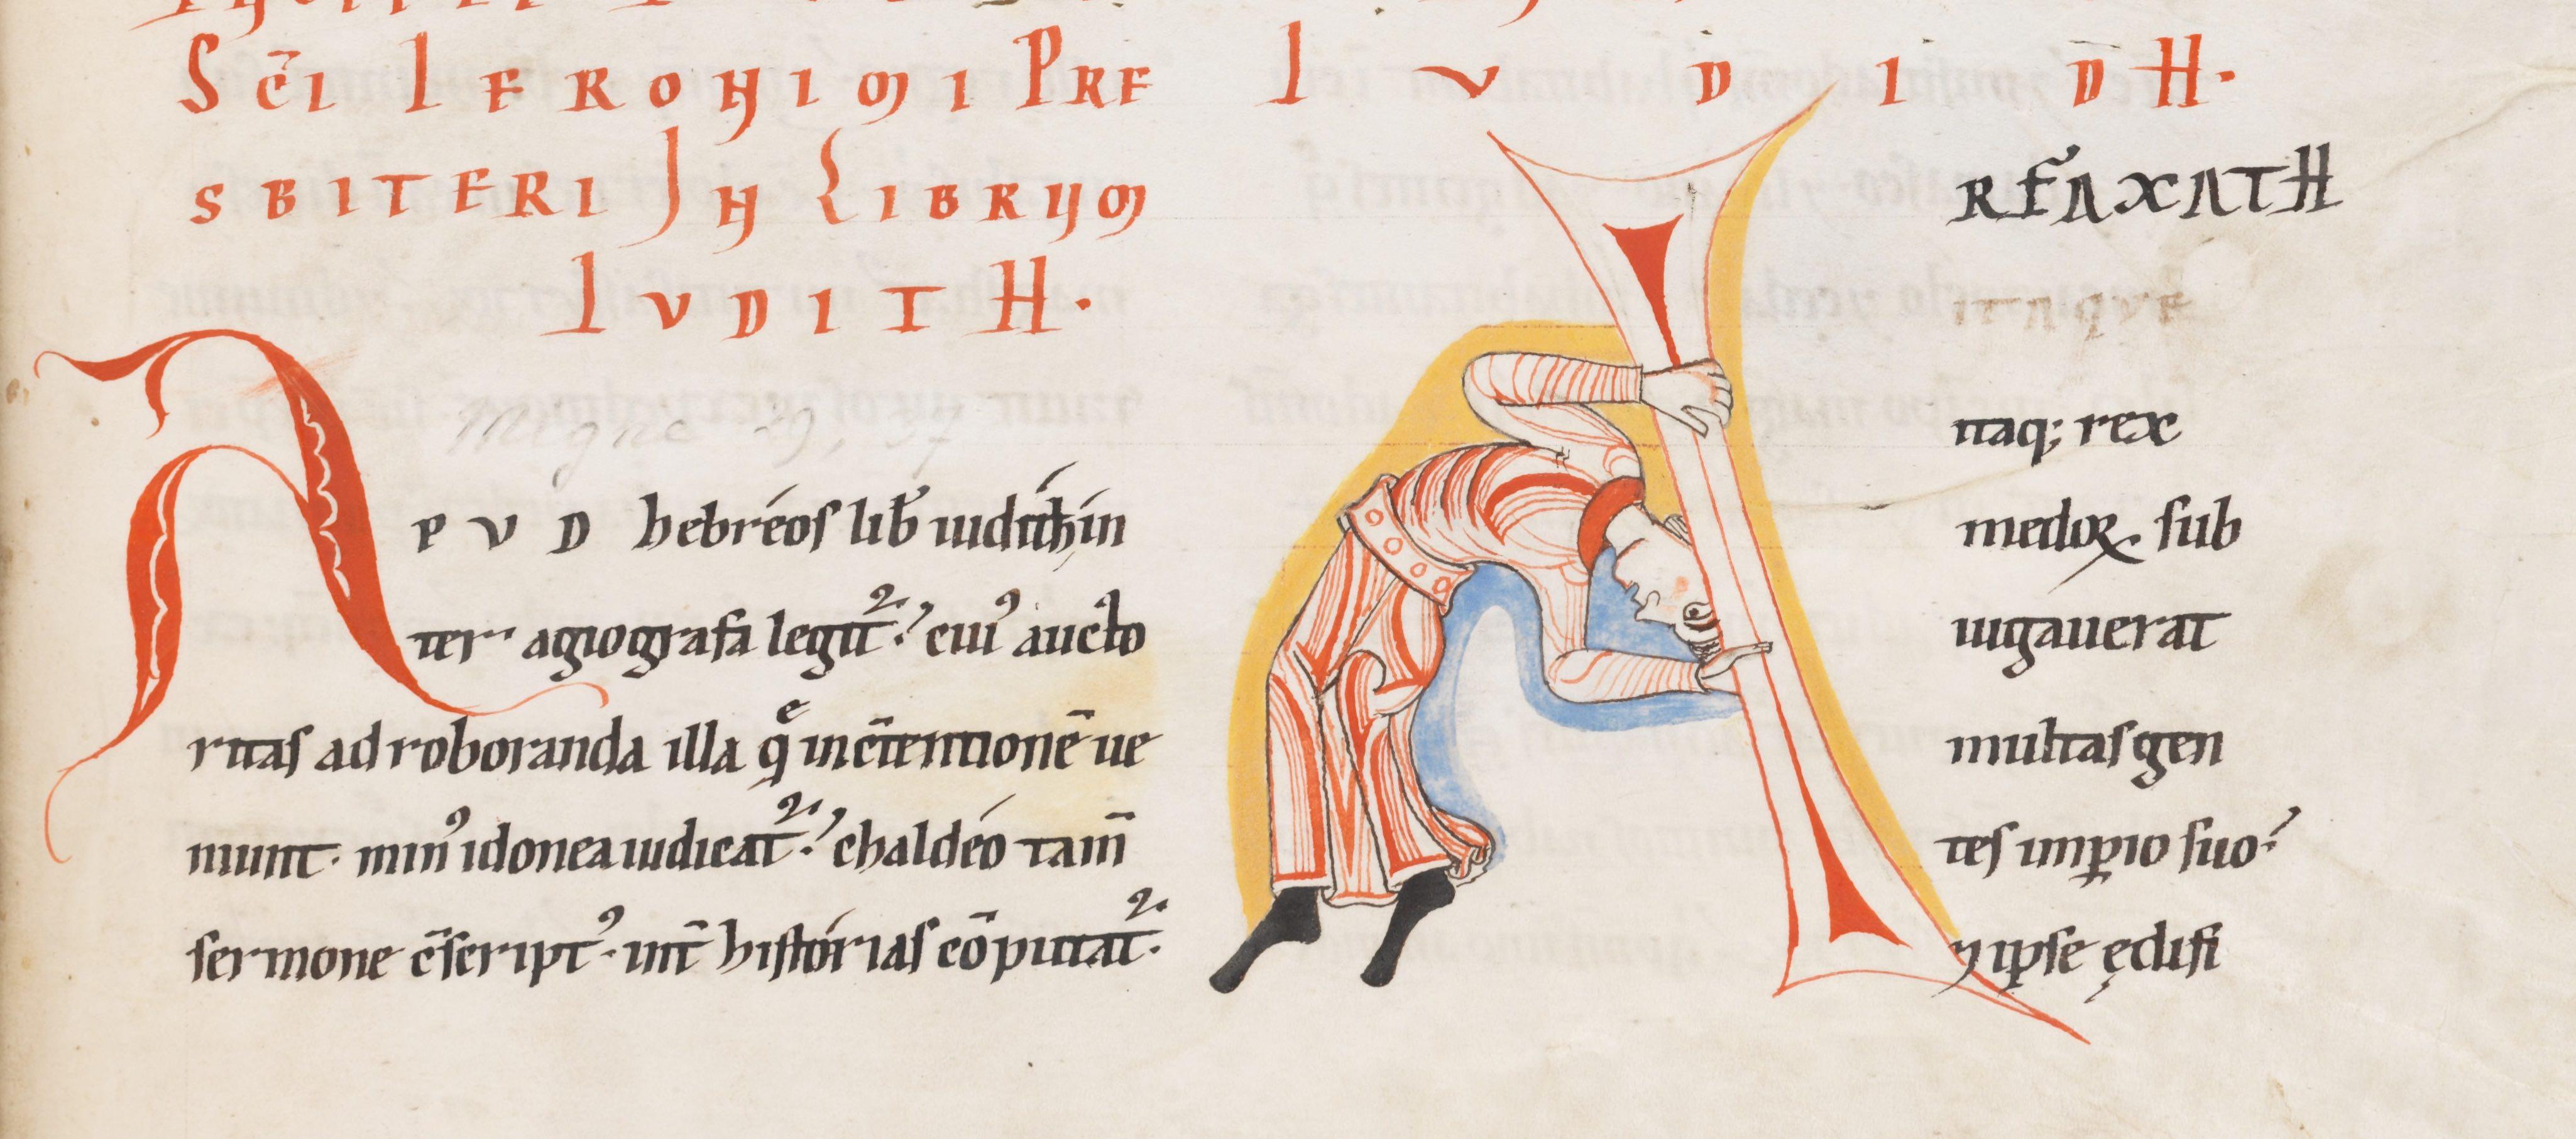 Typography Medievalbooks Pentul Men Engelberg Stifsbibliothek Ms 4 12th Century